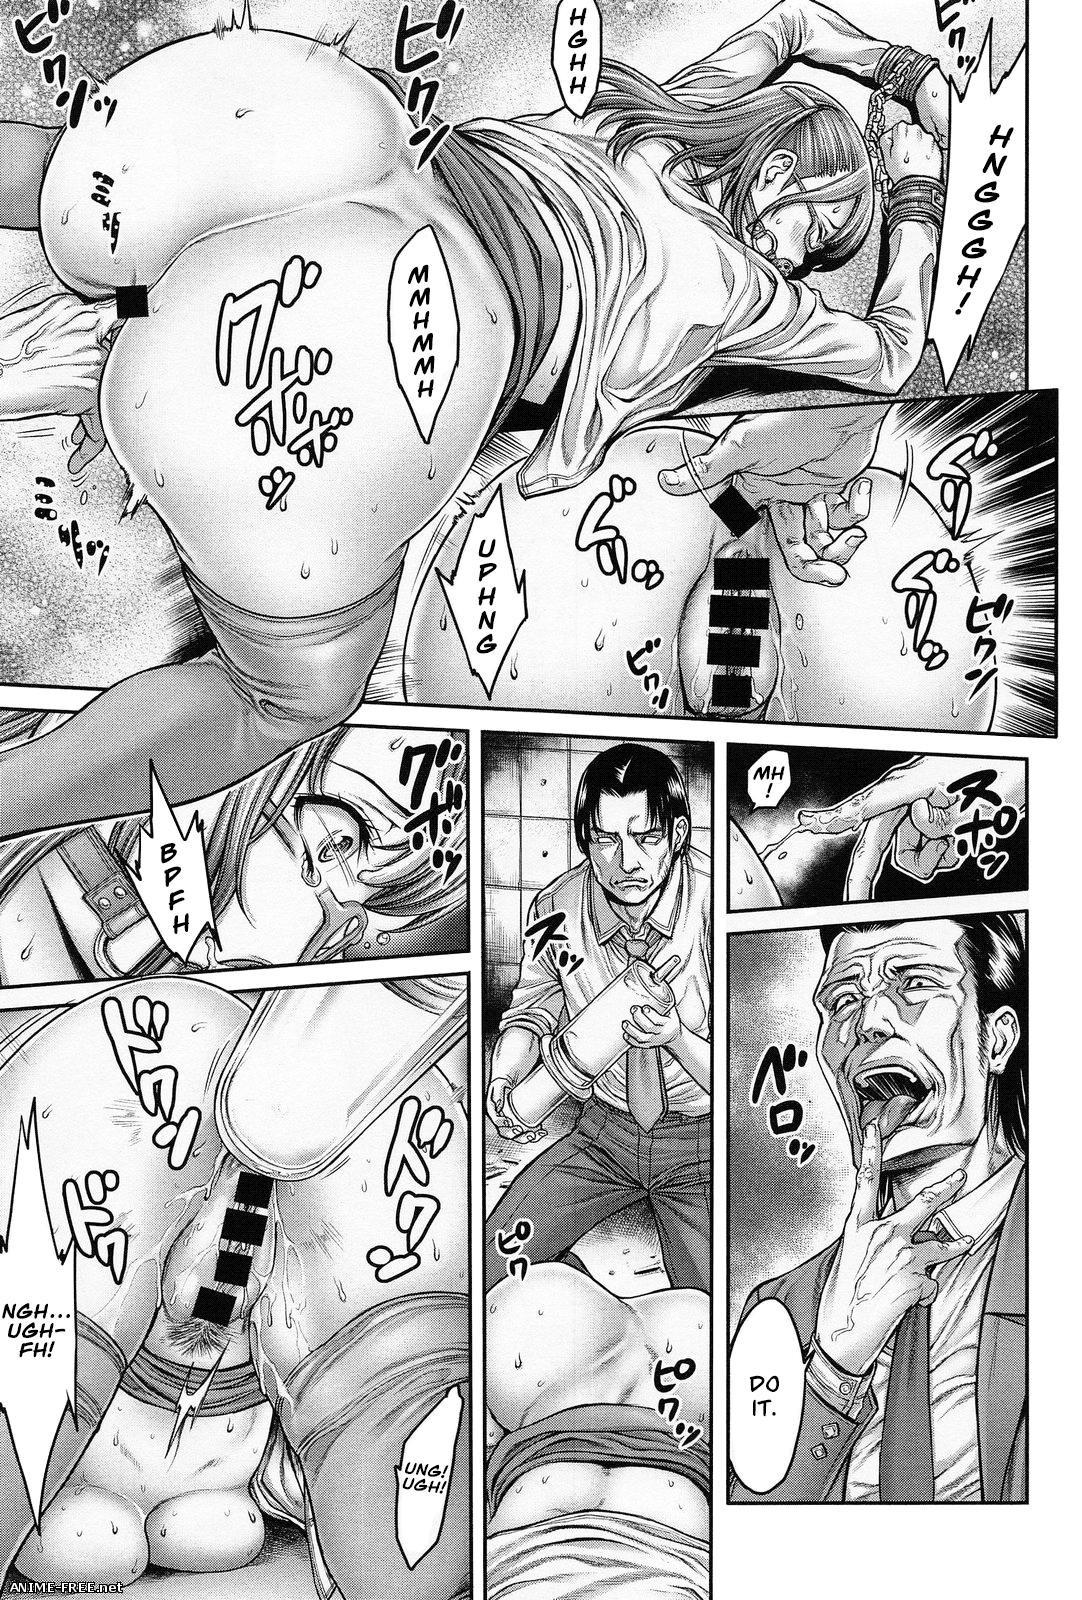 Okayu-san - Сборник хентай манги [Ptcen] [JAP,ENG,RUS] Manga Hentai